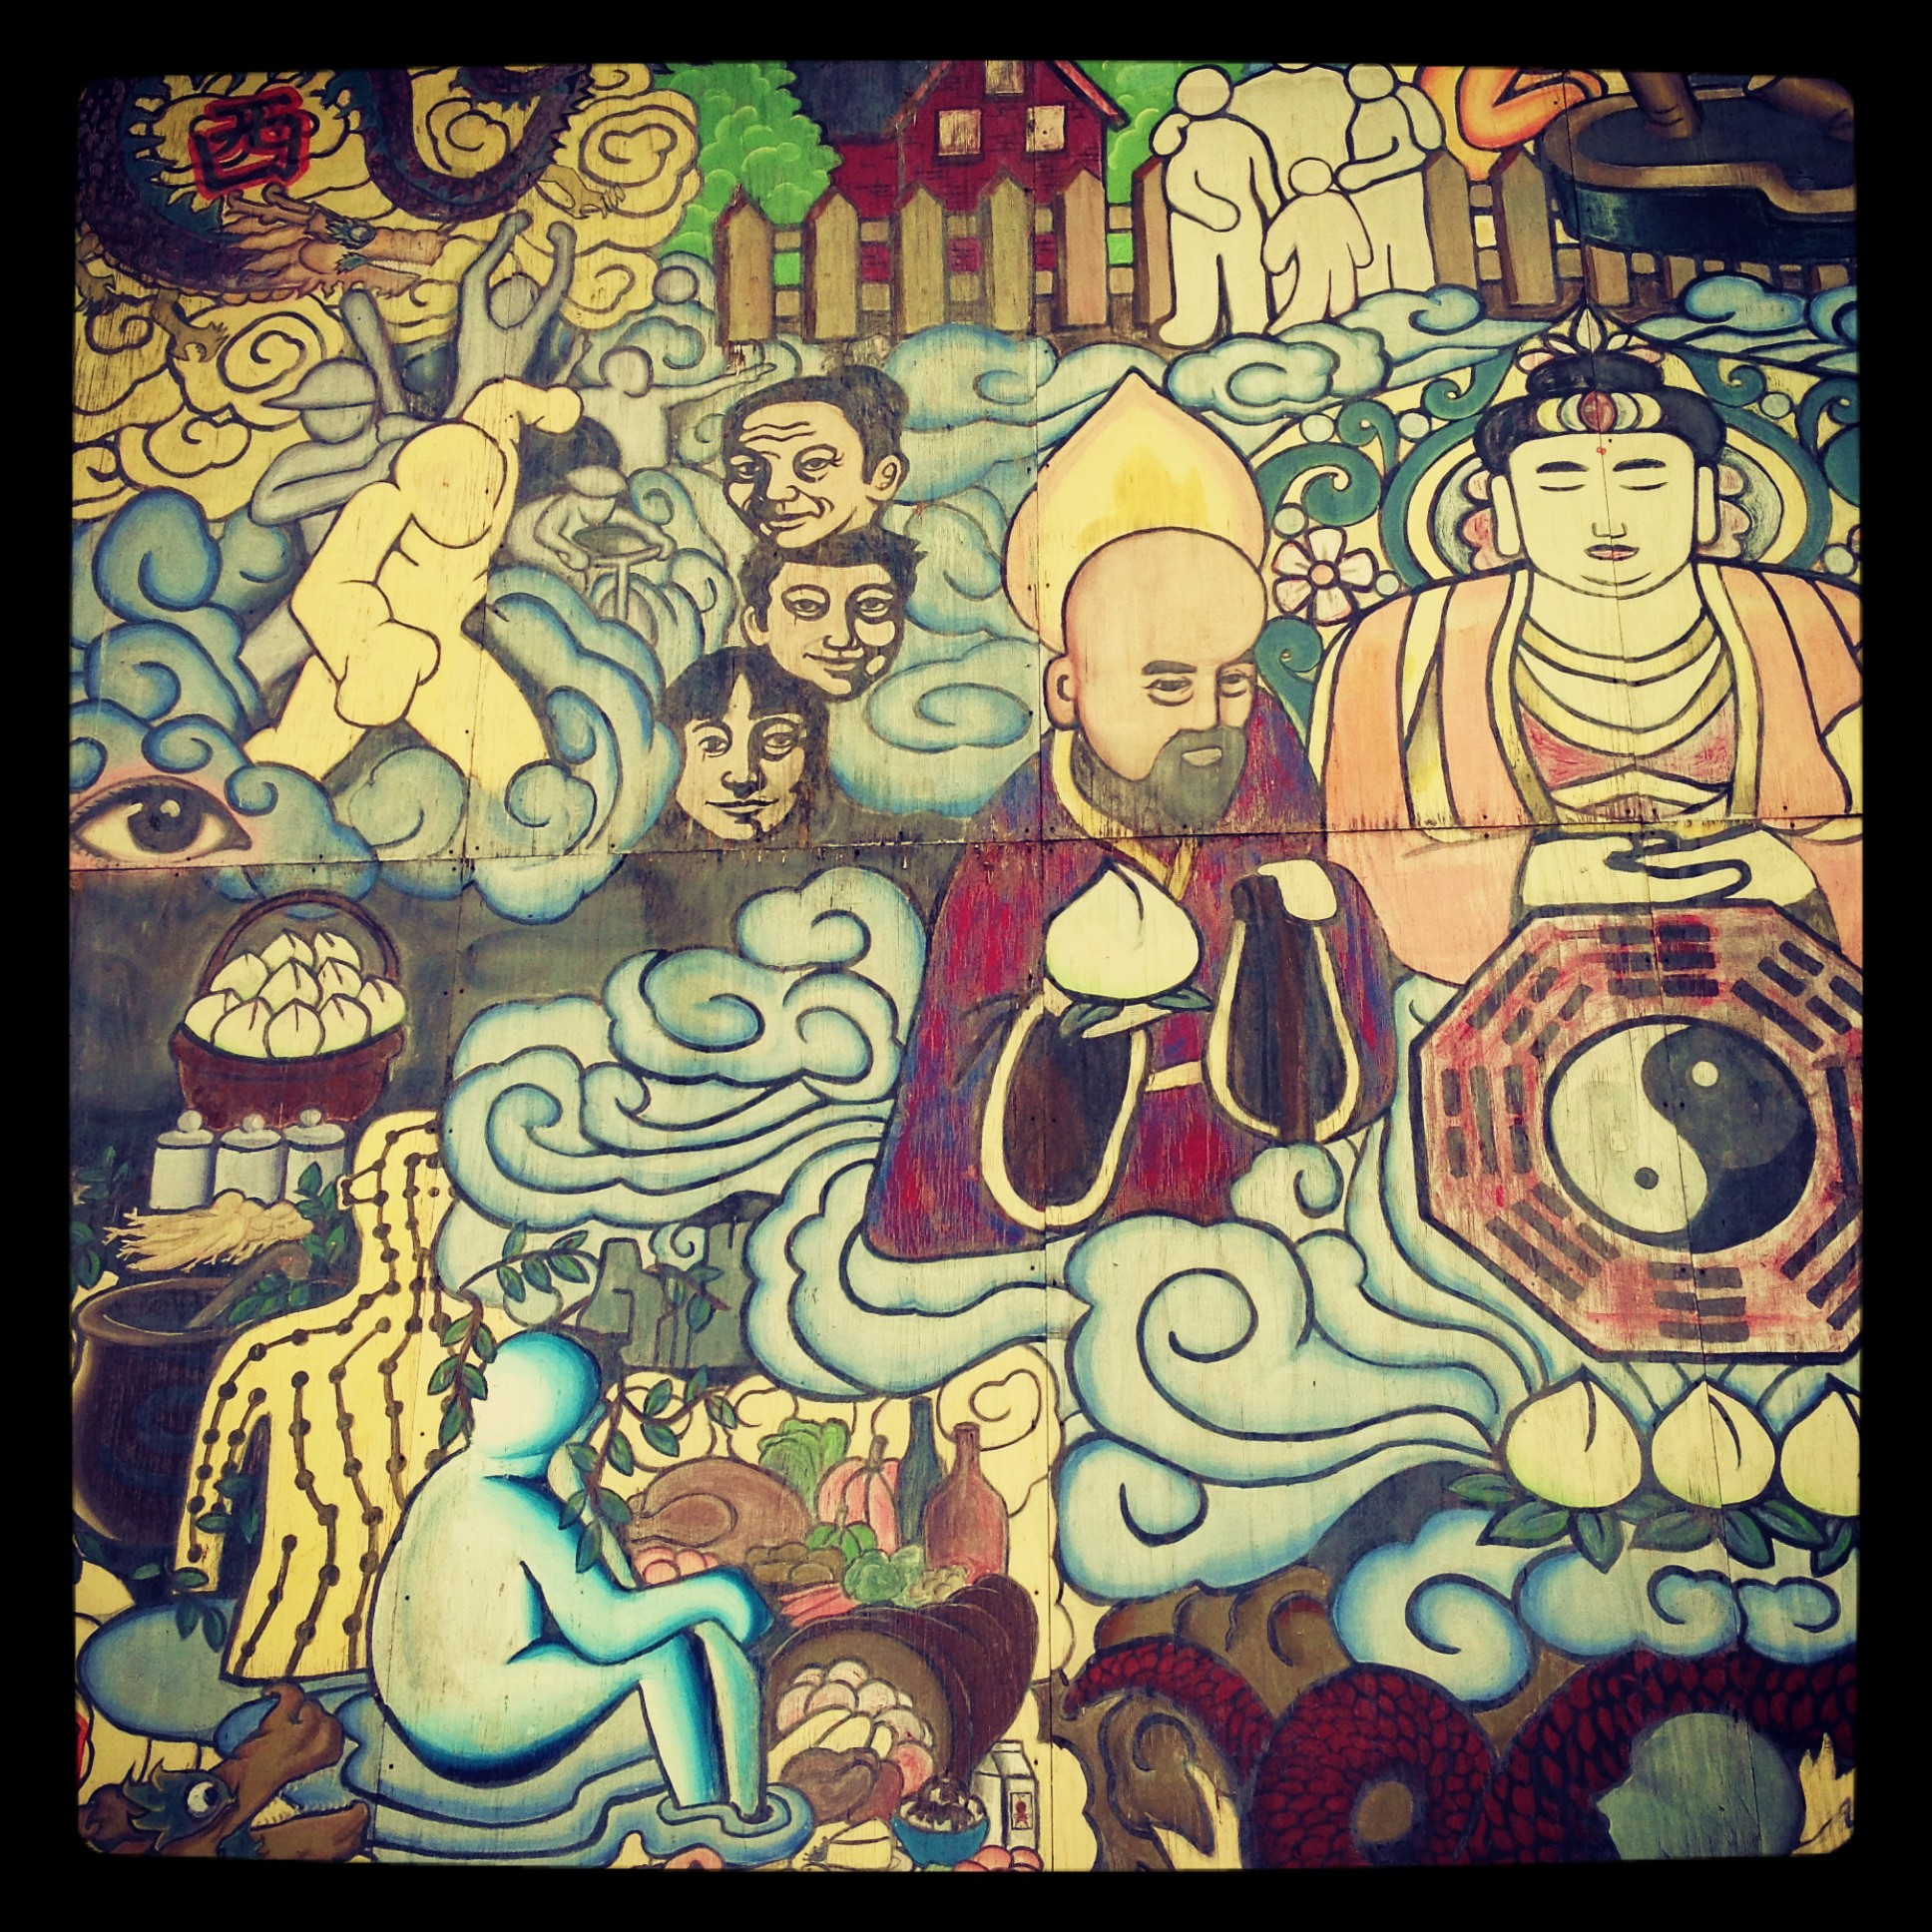 Boston street art chinatown parking lot mural tokidoki for Audrey hepburn mural los angeles